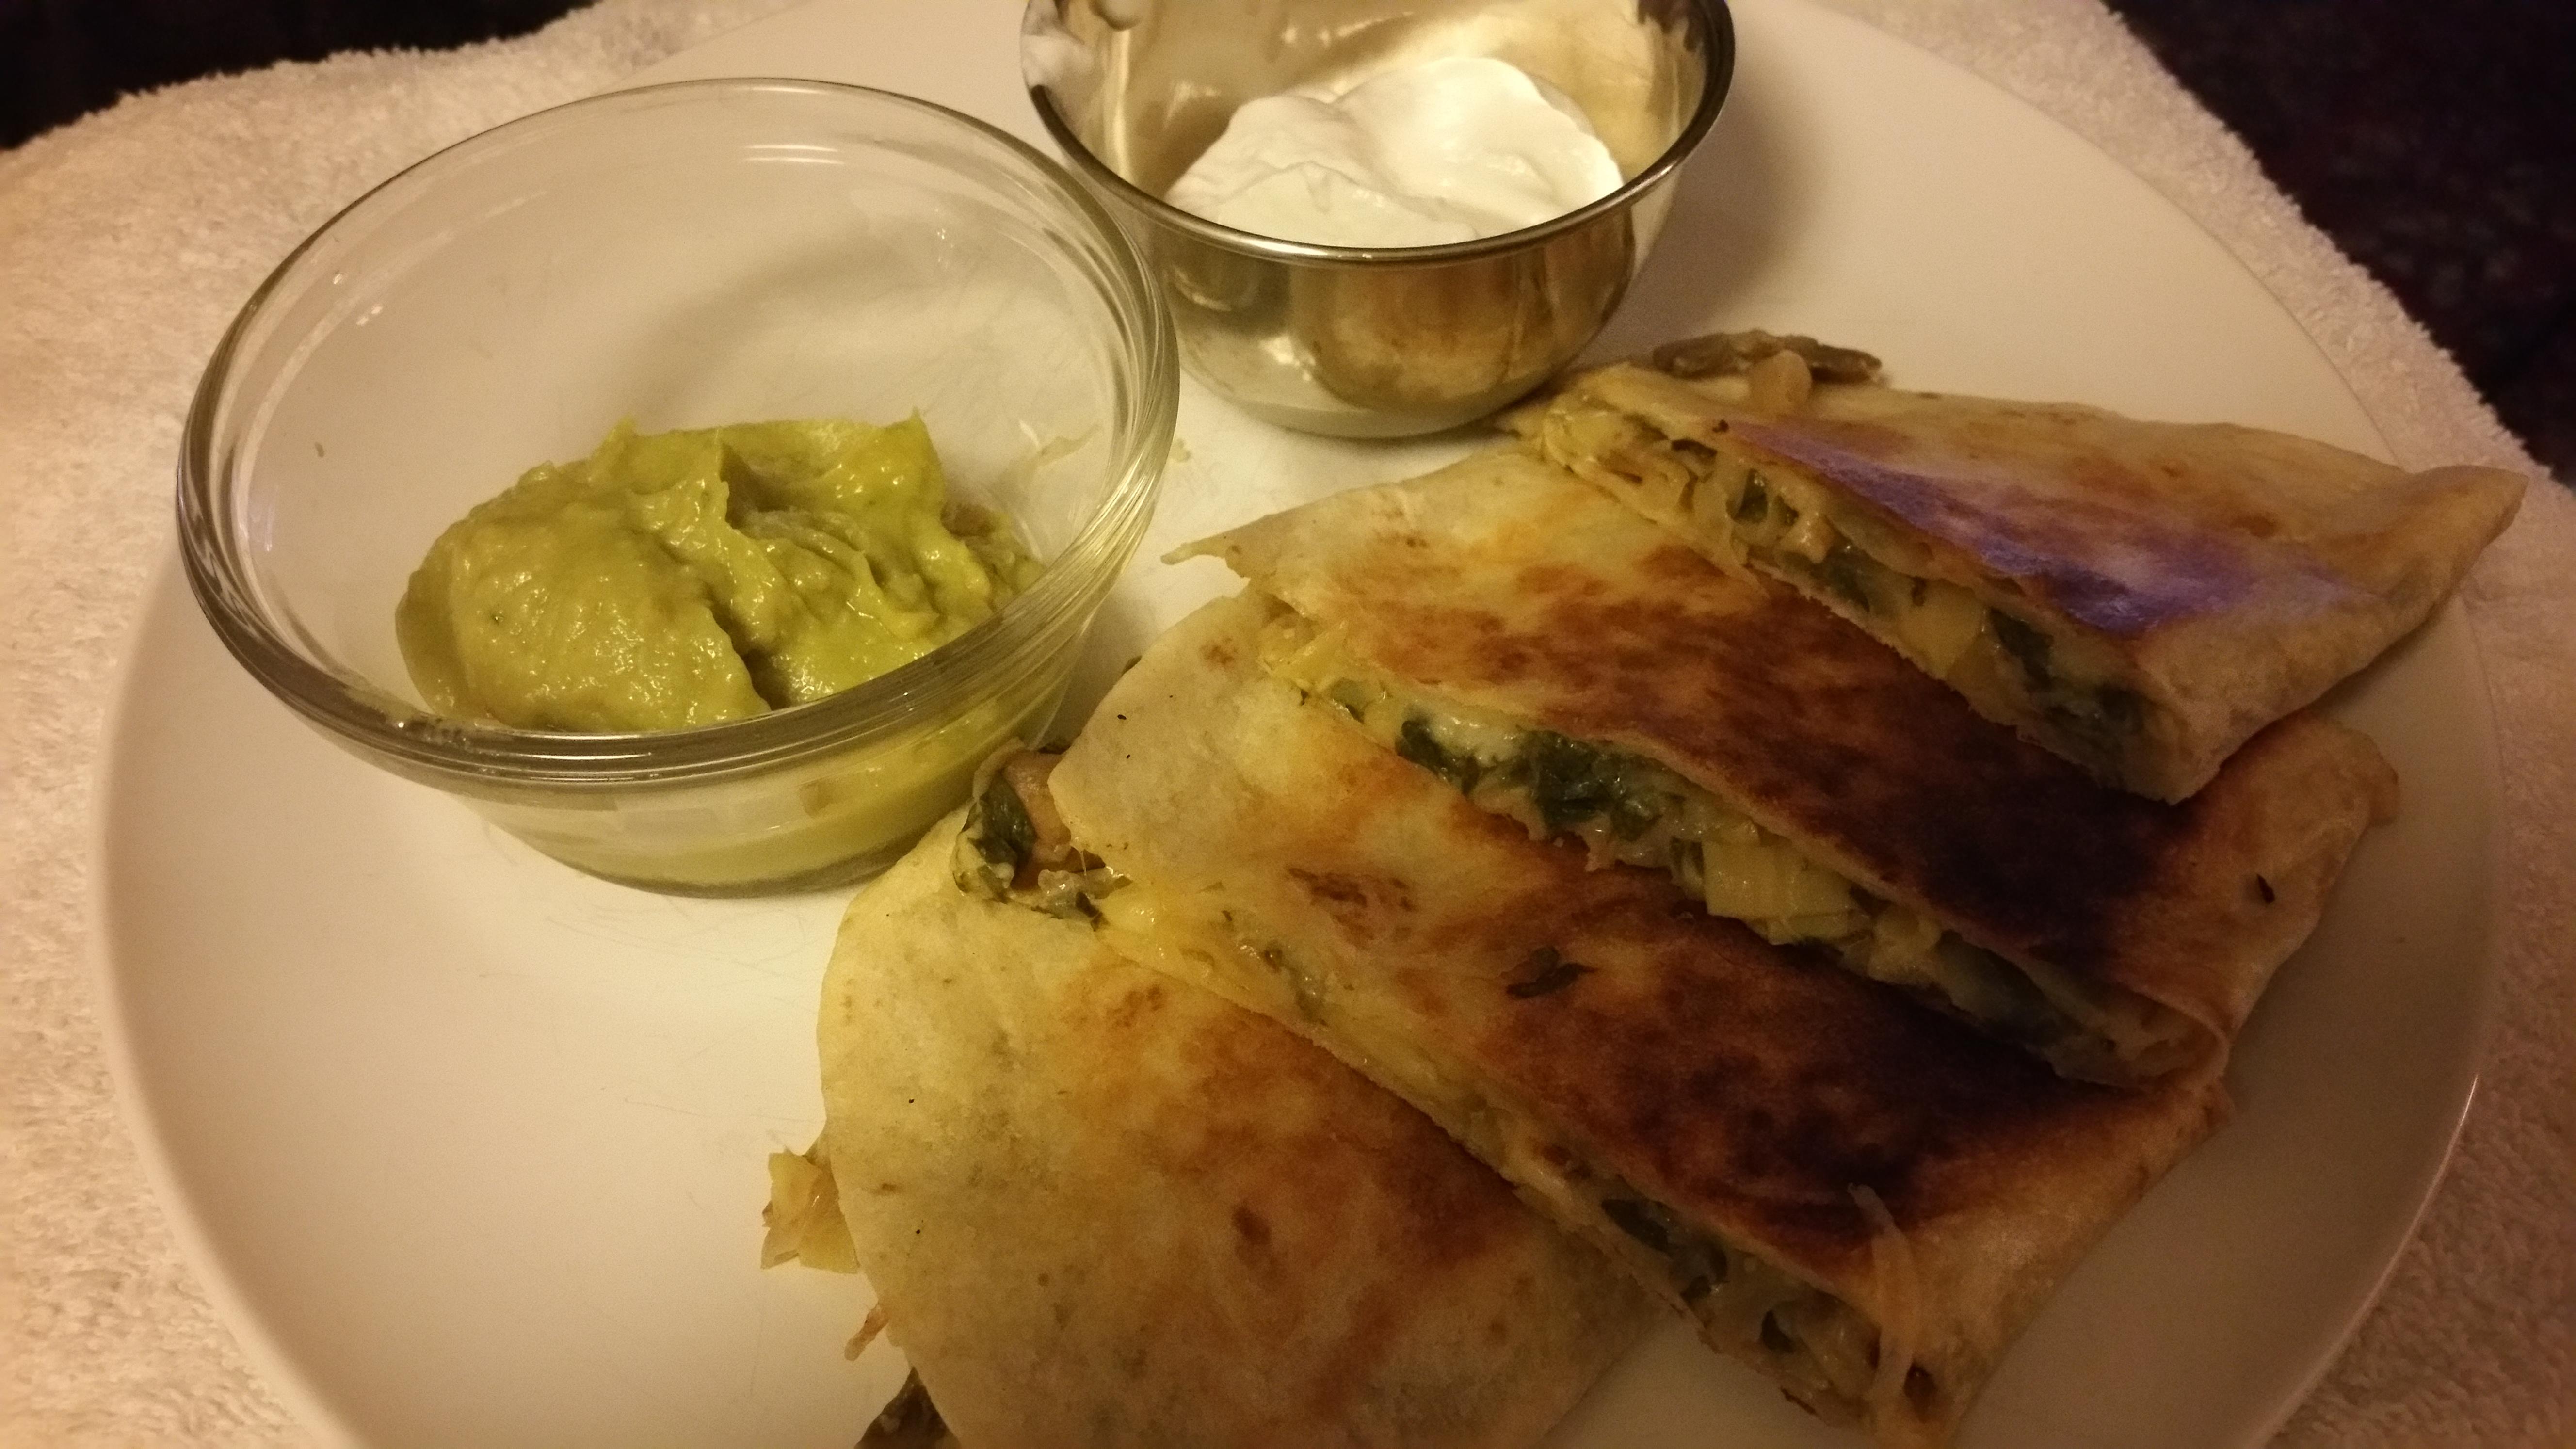 Mushroom Spinach & Smoked Gouda Quesadillas